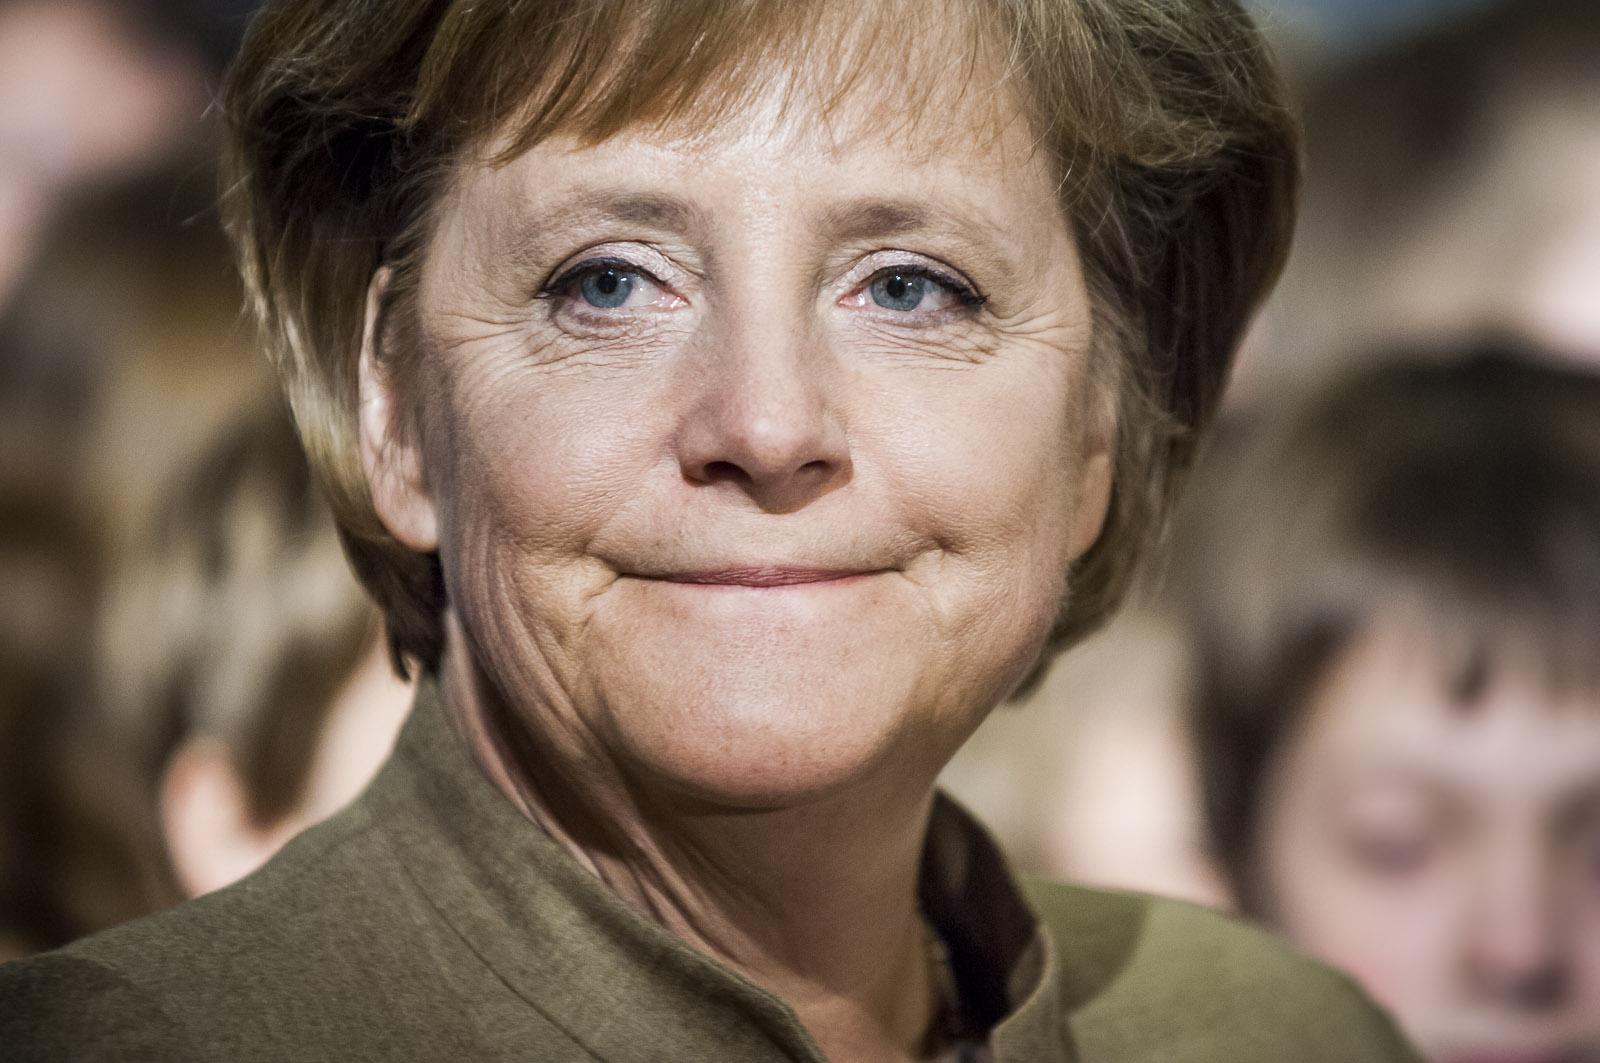 VERANSTALTUNGEN: Angela Merkel, Bundeskanzlerin